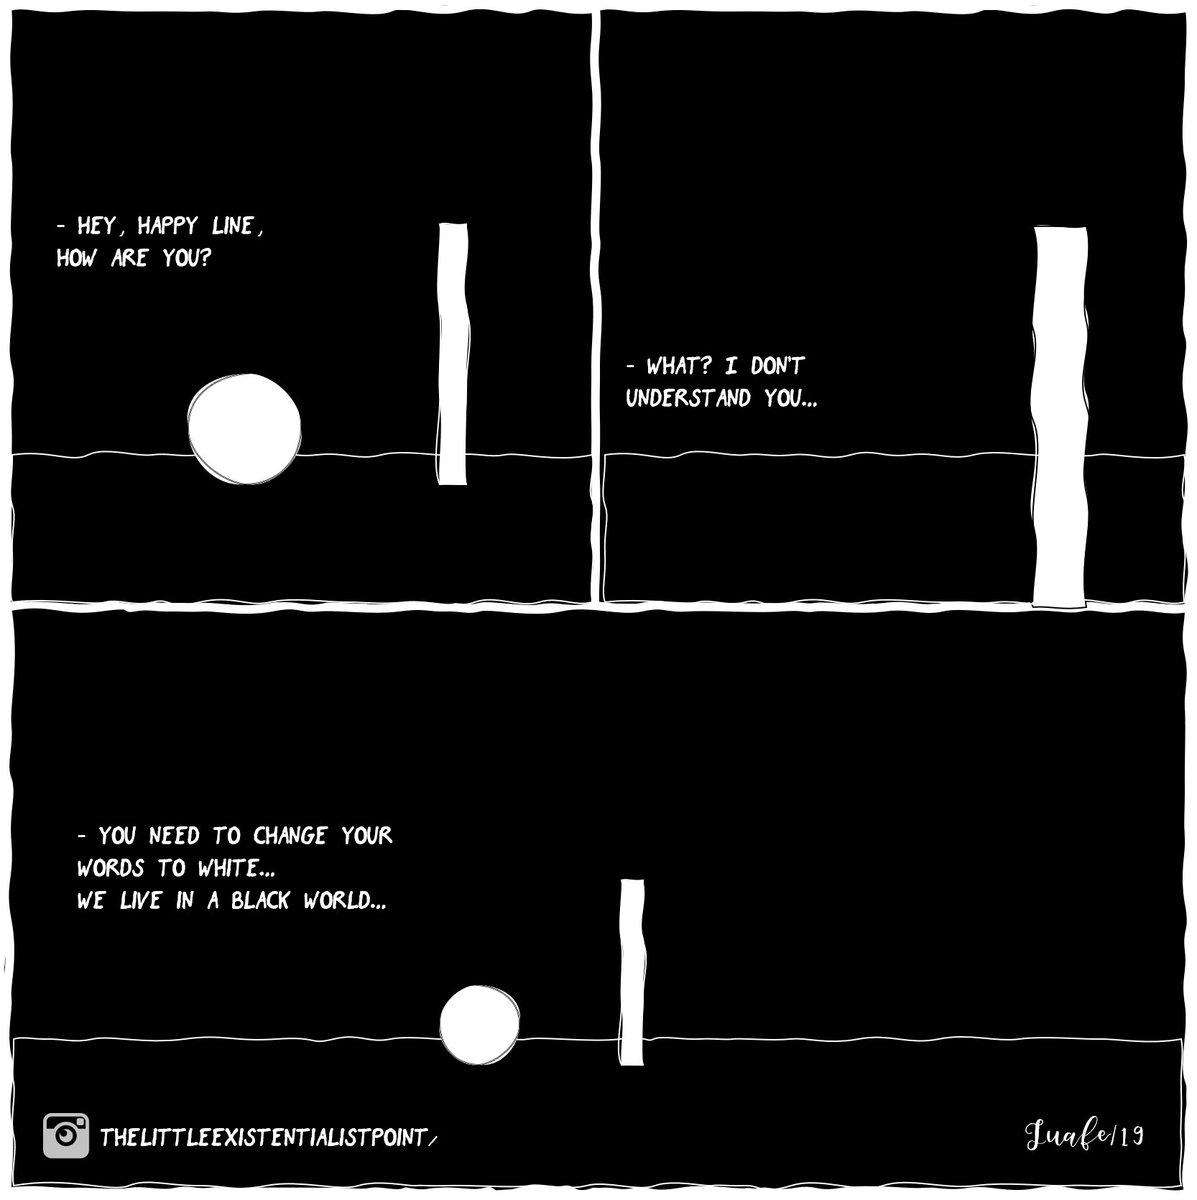 #Existencialist #Philosophy #Philosophicalmemes #philosophymemes #philosophydilorenzoserafini #philosophyquotes  #memestagram #memes #philosophyquotes #philosophymeme #quotes #existencialism #literature #literaturequotes #literaturememes #literaturelover #freedom #freepic.twitter.com/uMdcwrCNFn